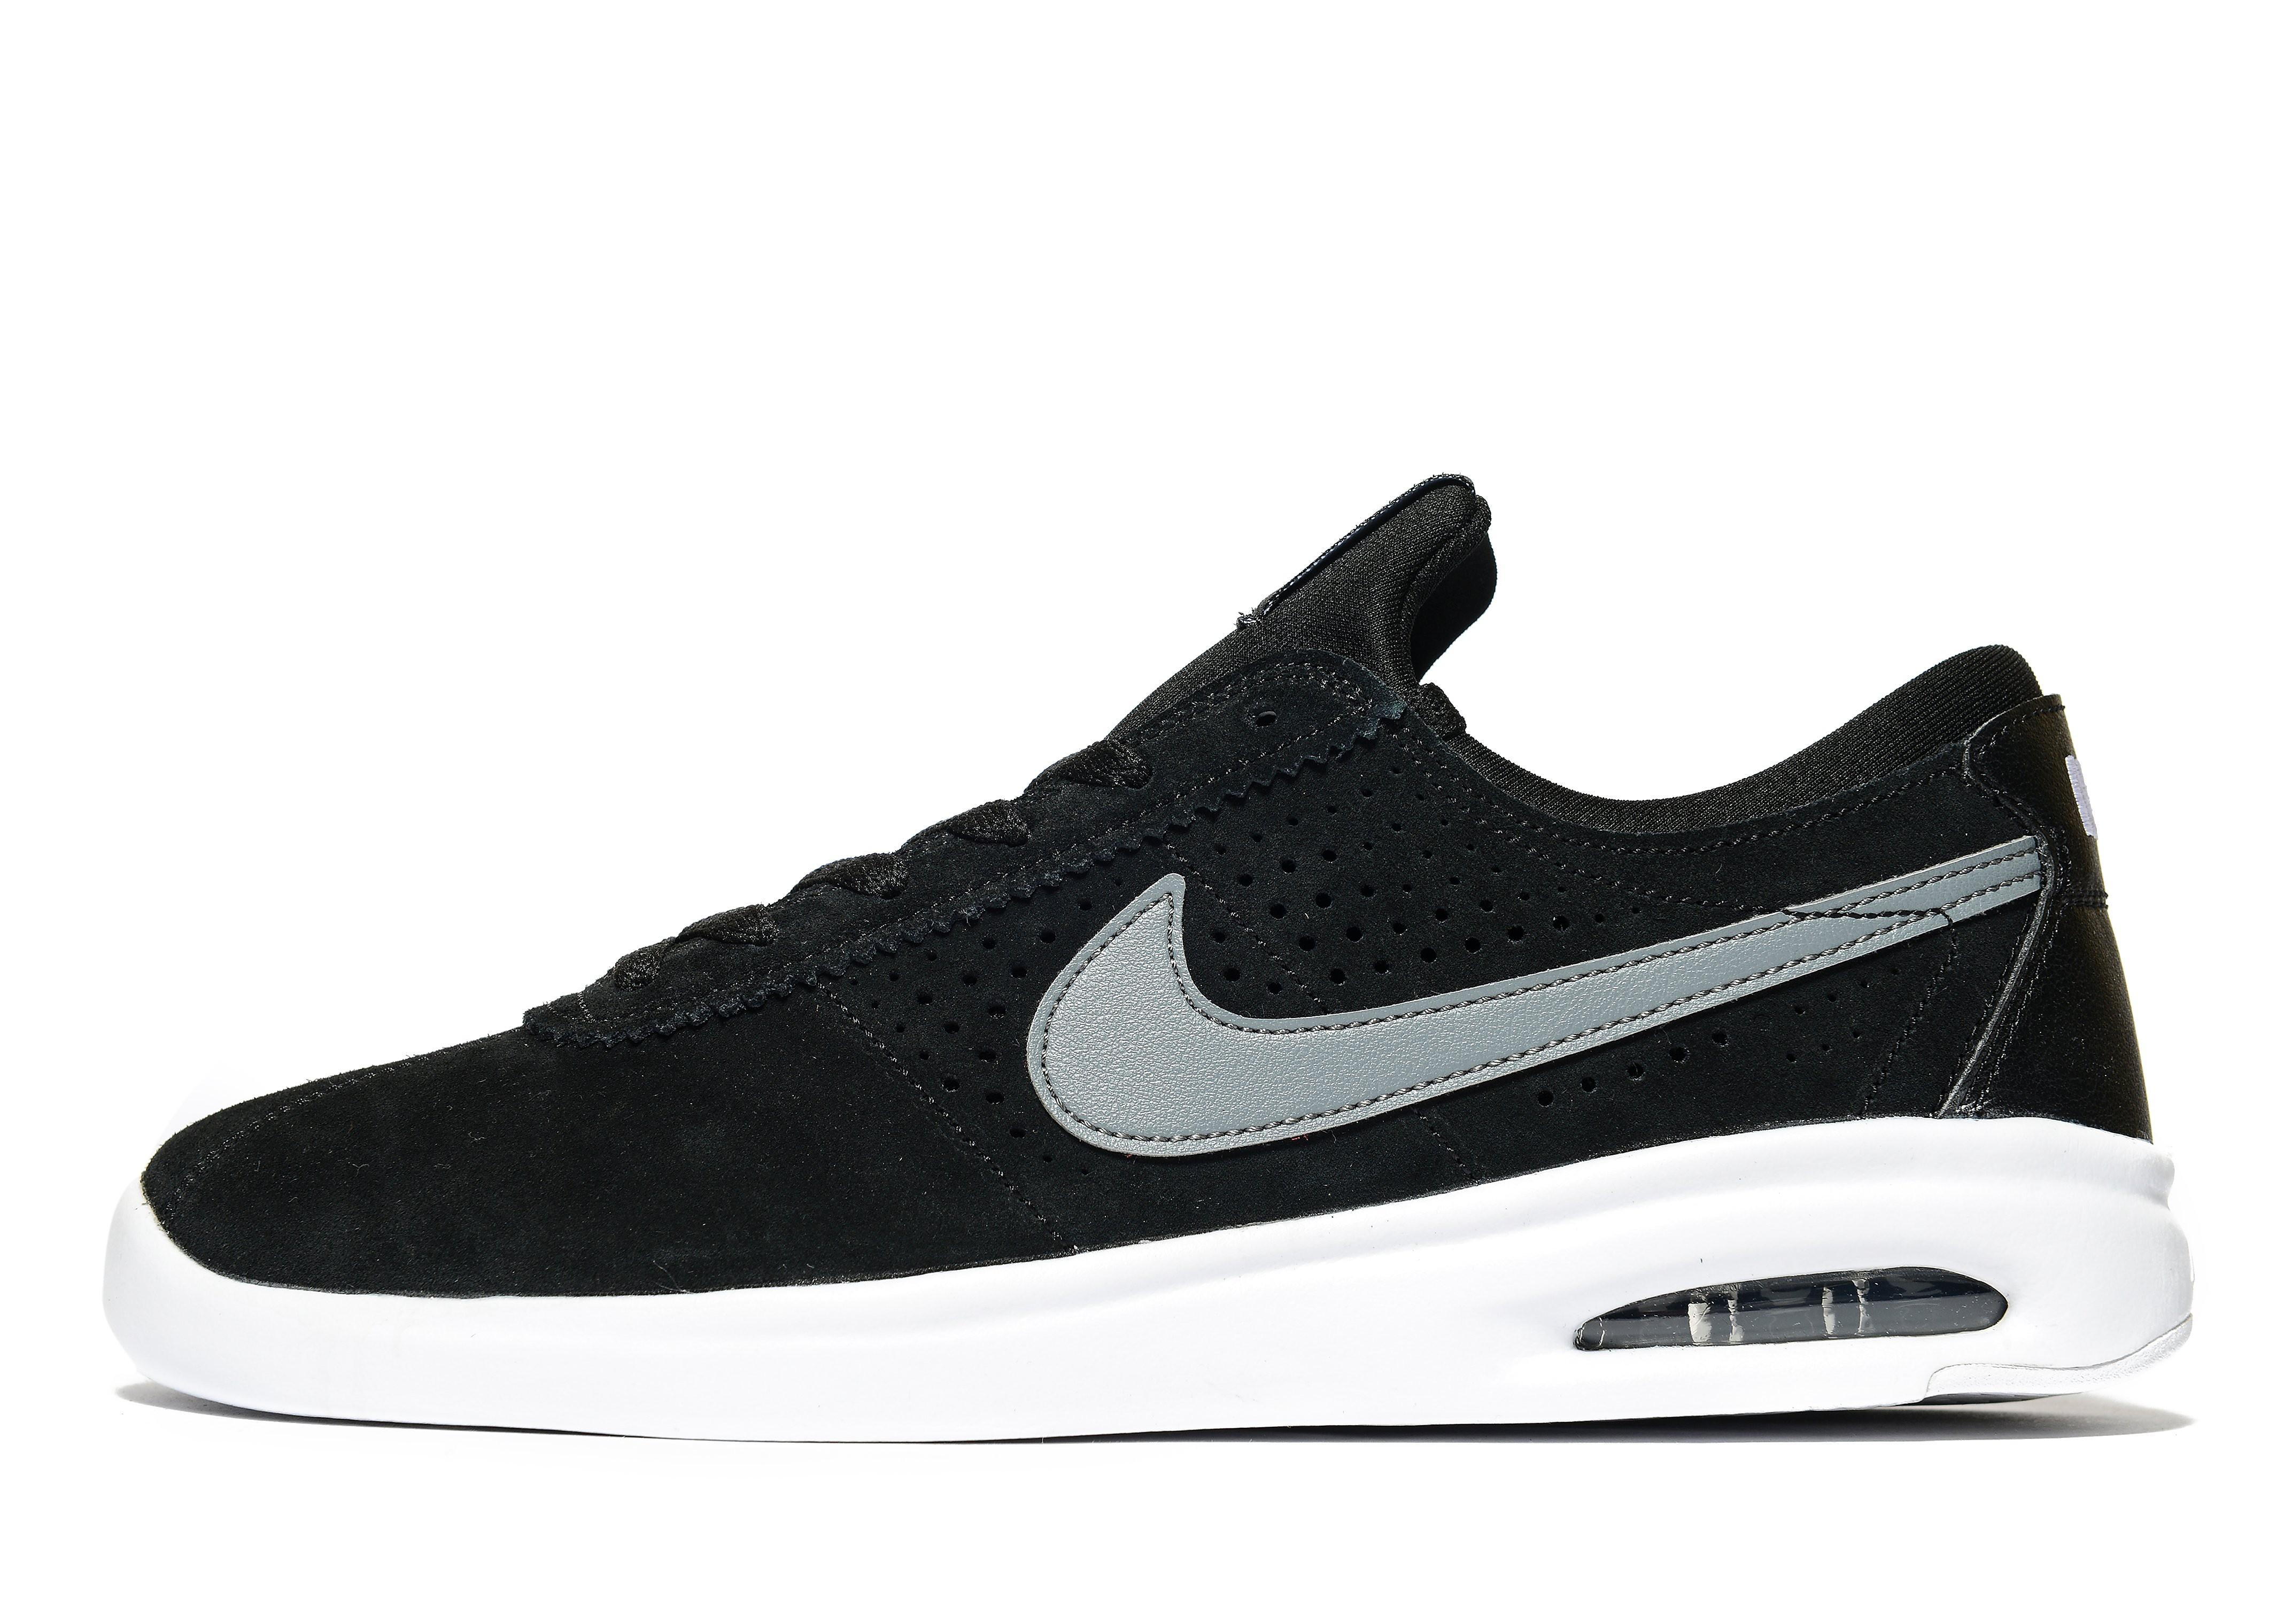 Nike SB Bruin Max